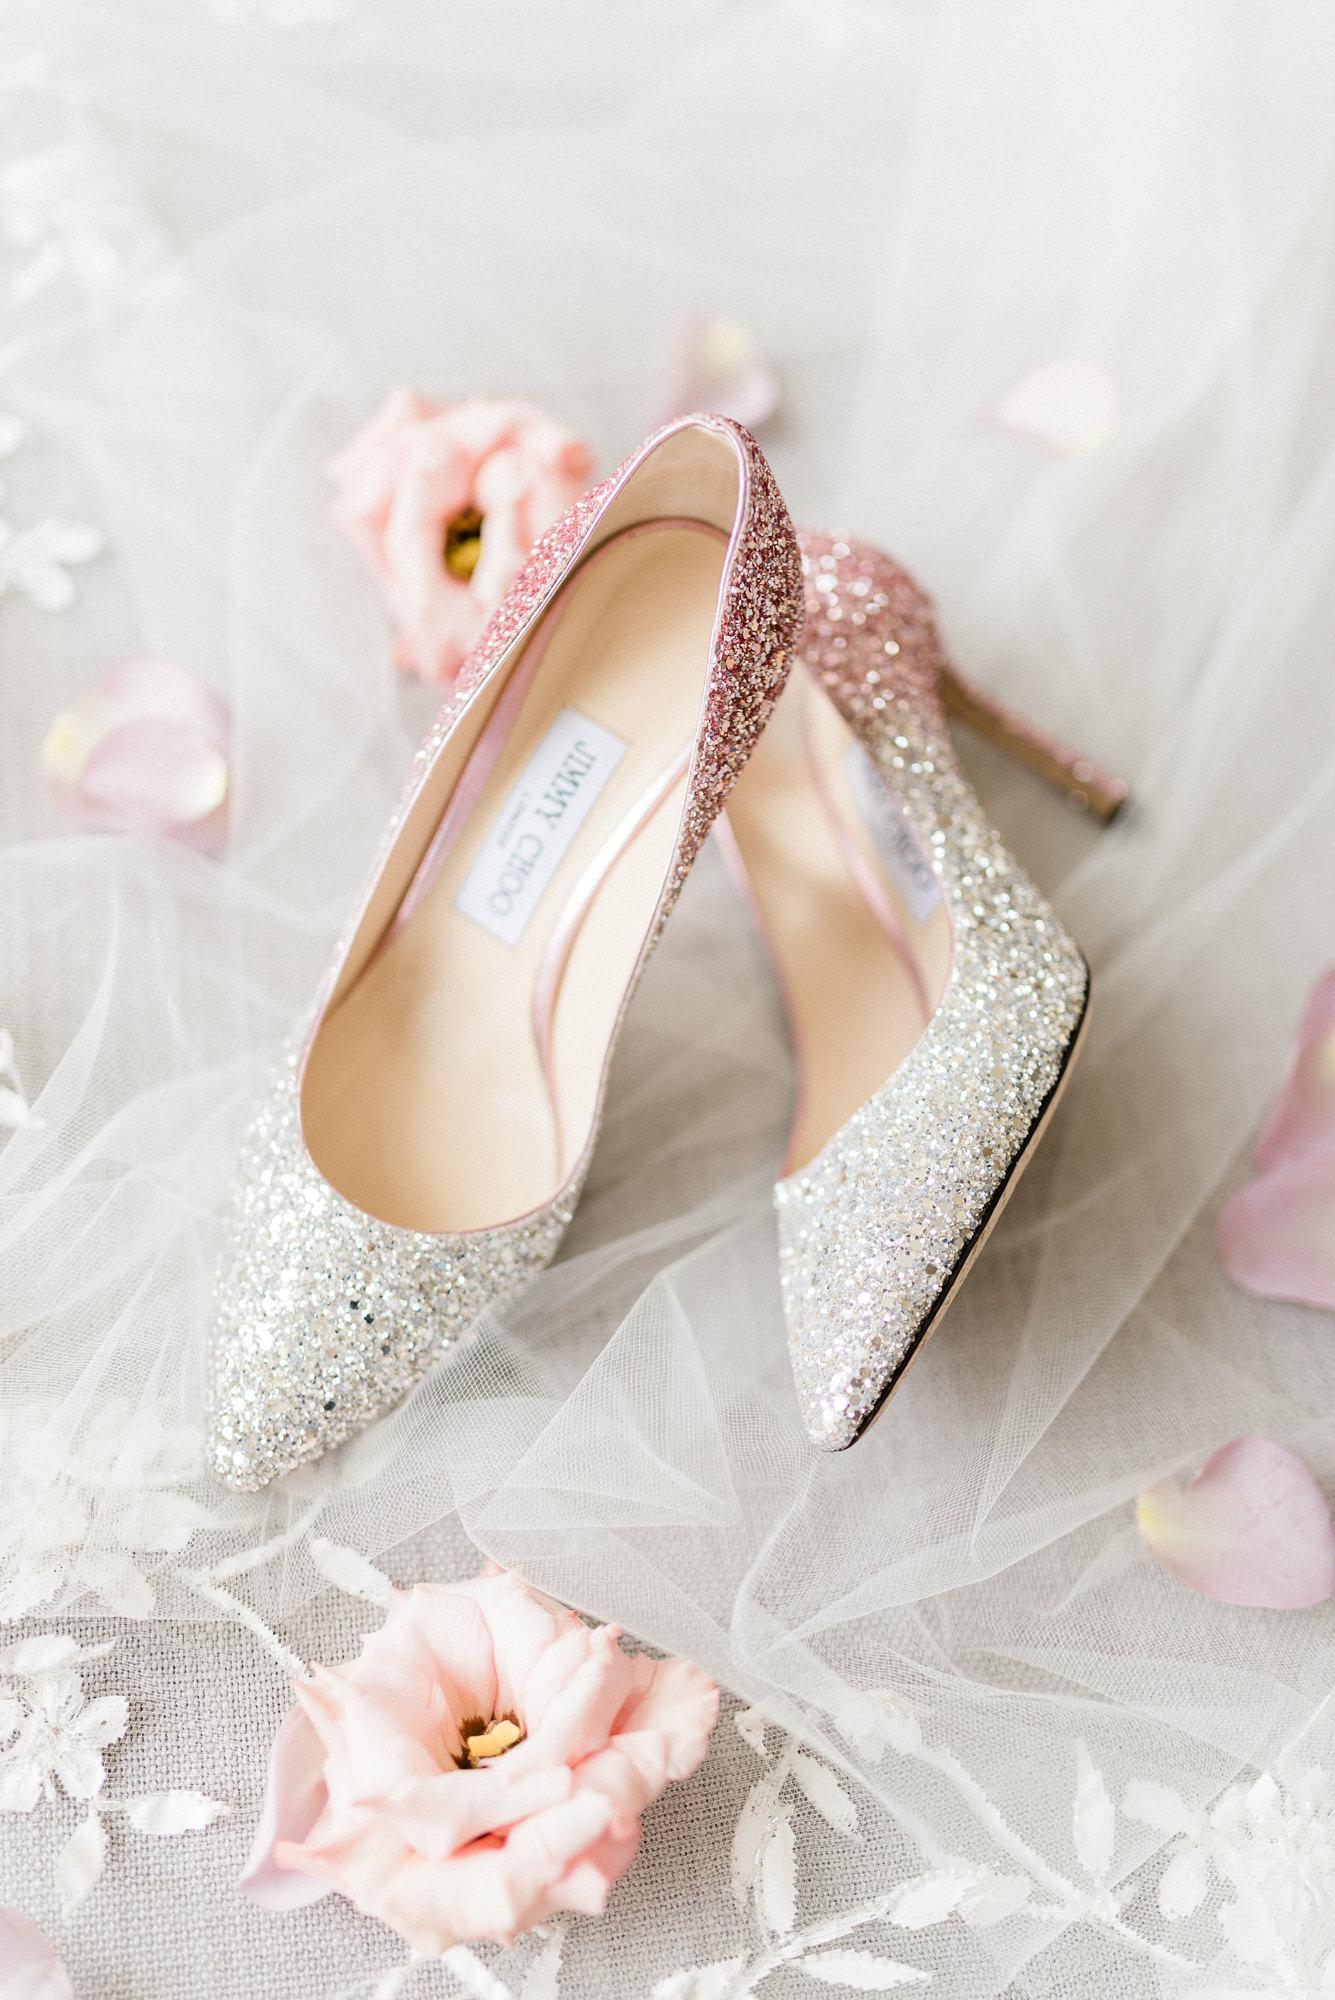 jimmy-choo-sparkle-wedding-pumps-worlds-best-wedding-photos-gianluca-adiovaso-italy-wedding-photographers